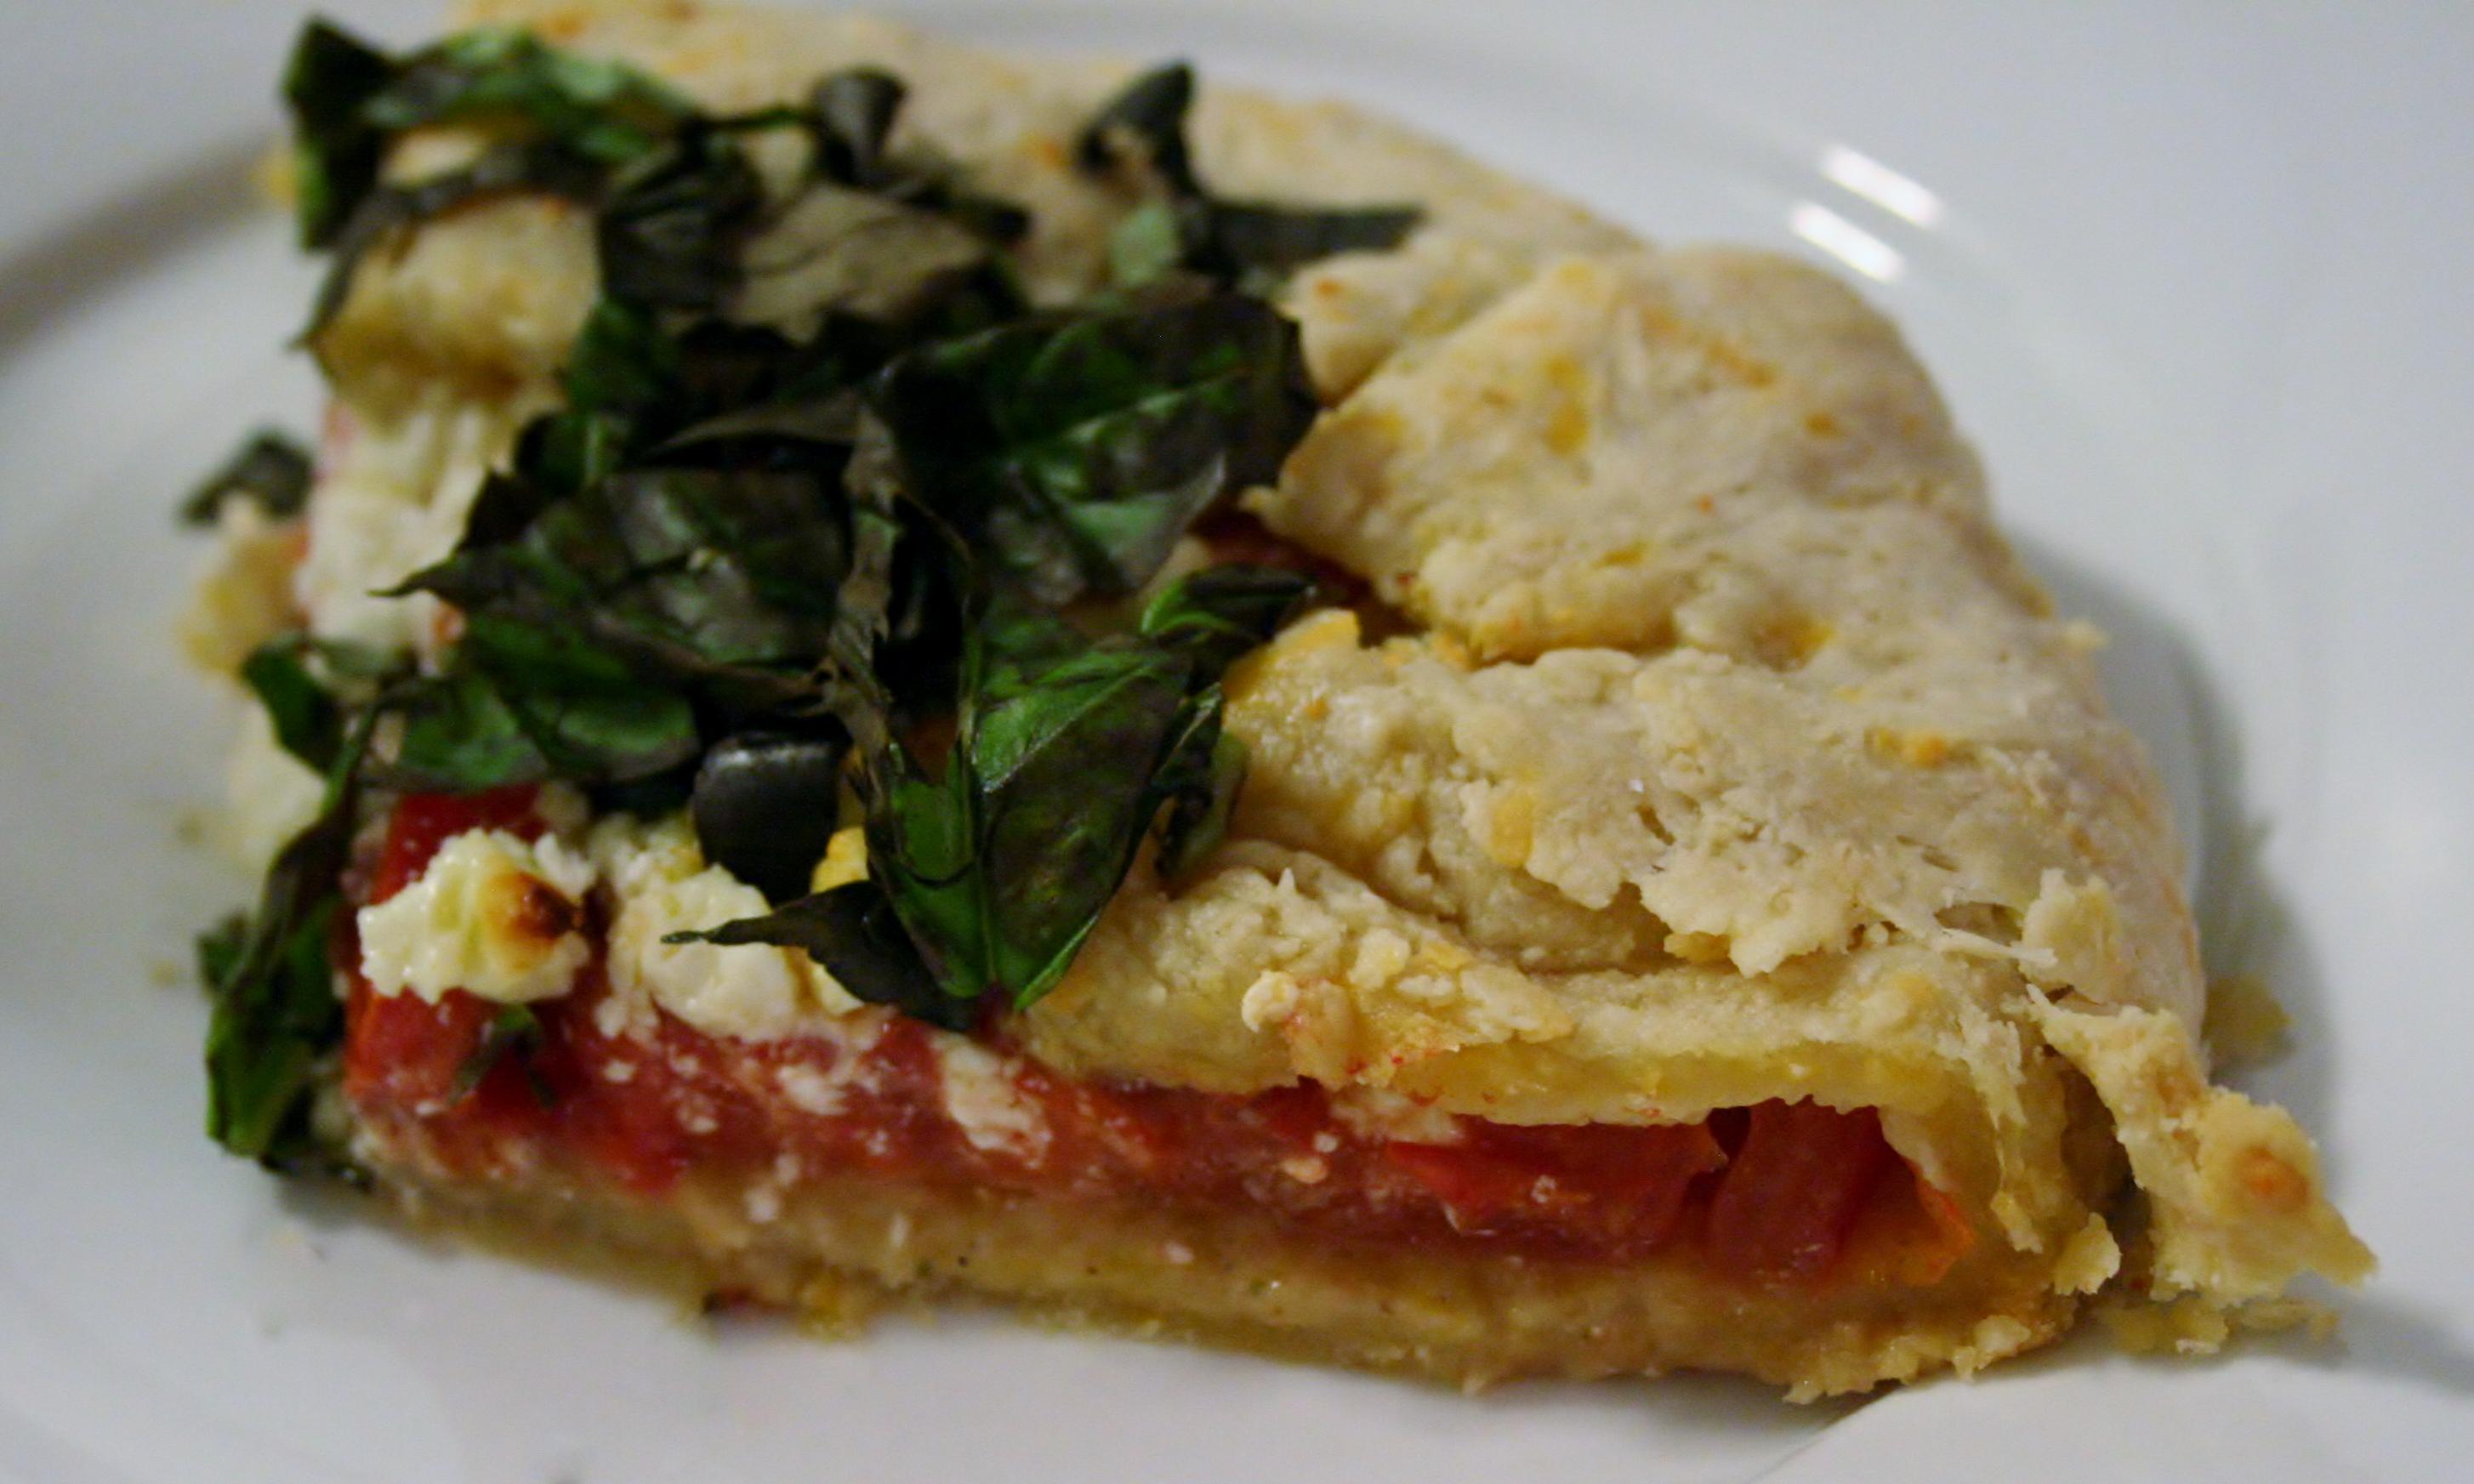 Plum Tomato Pie {Really a Galette}